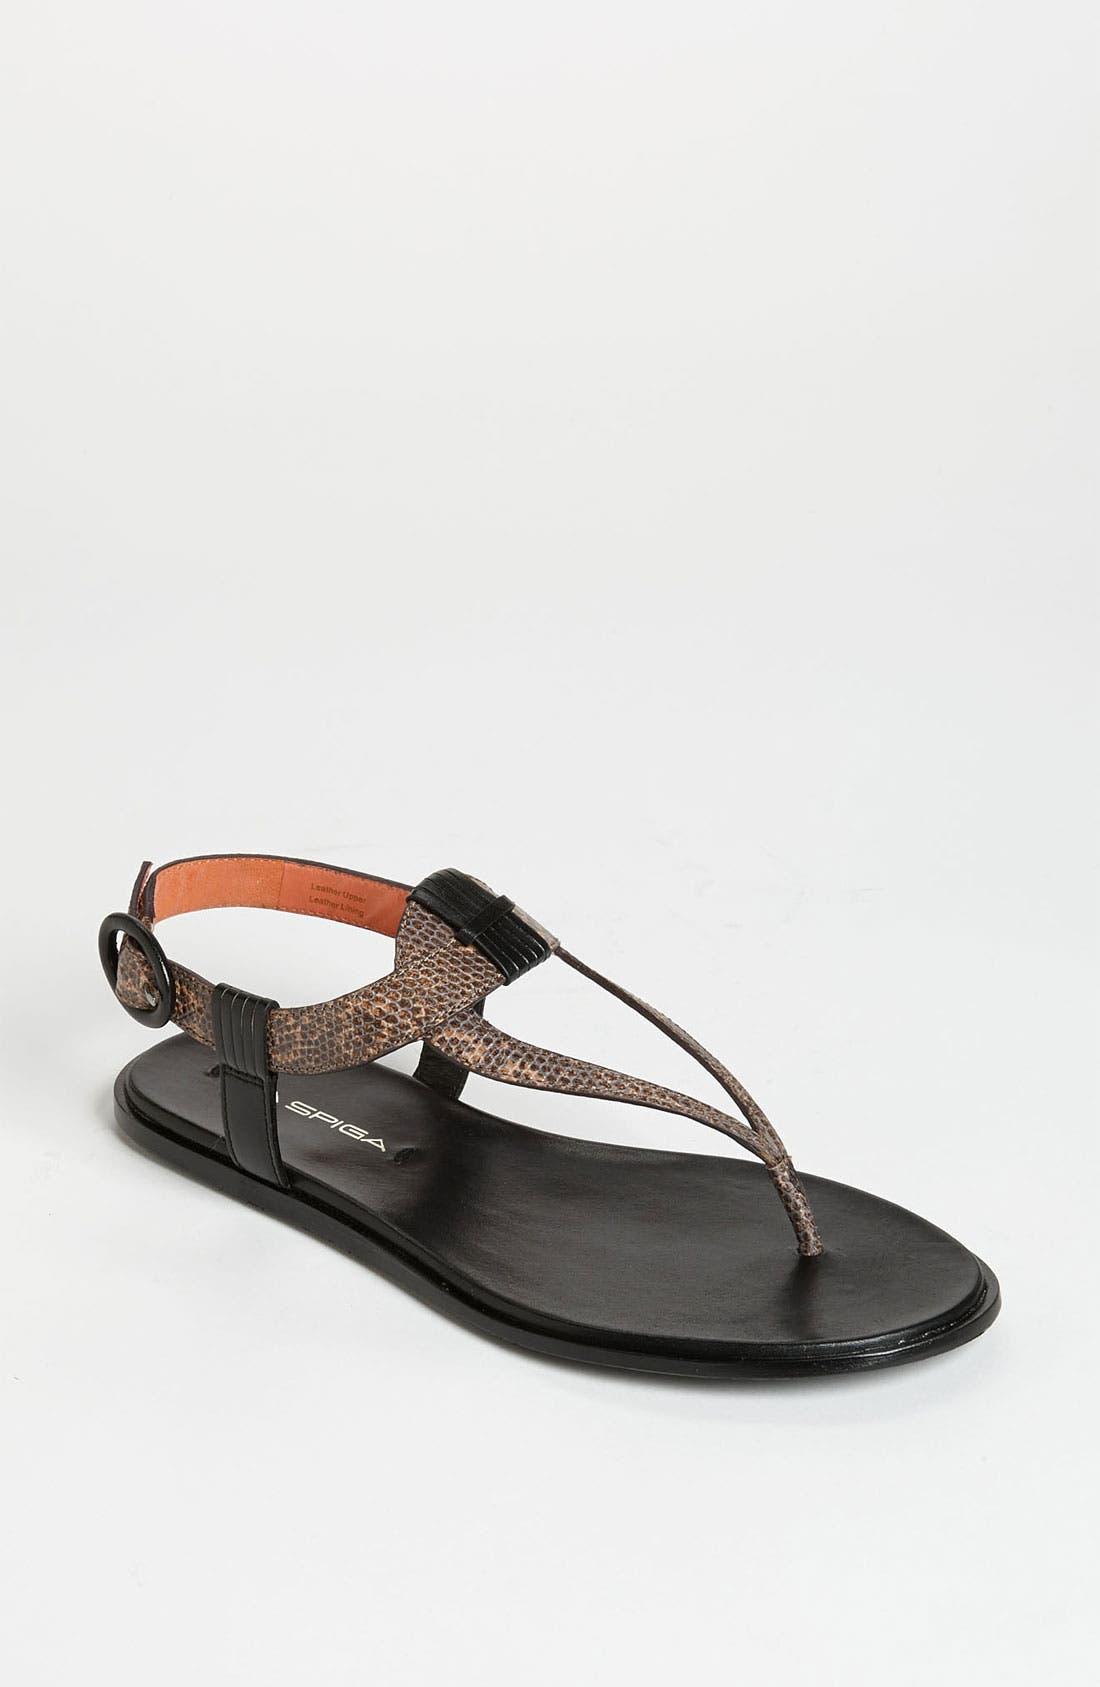 Alternate Image 1 Selected - Via Spiga 'Capris' Sandal